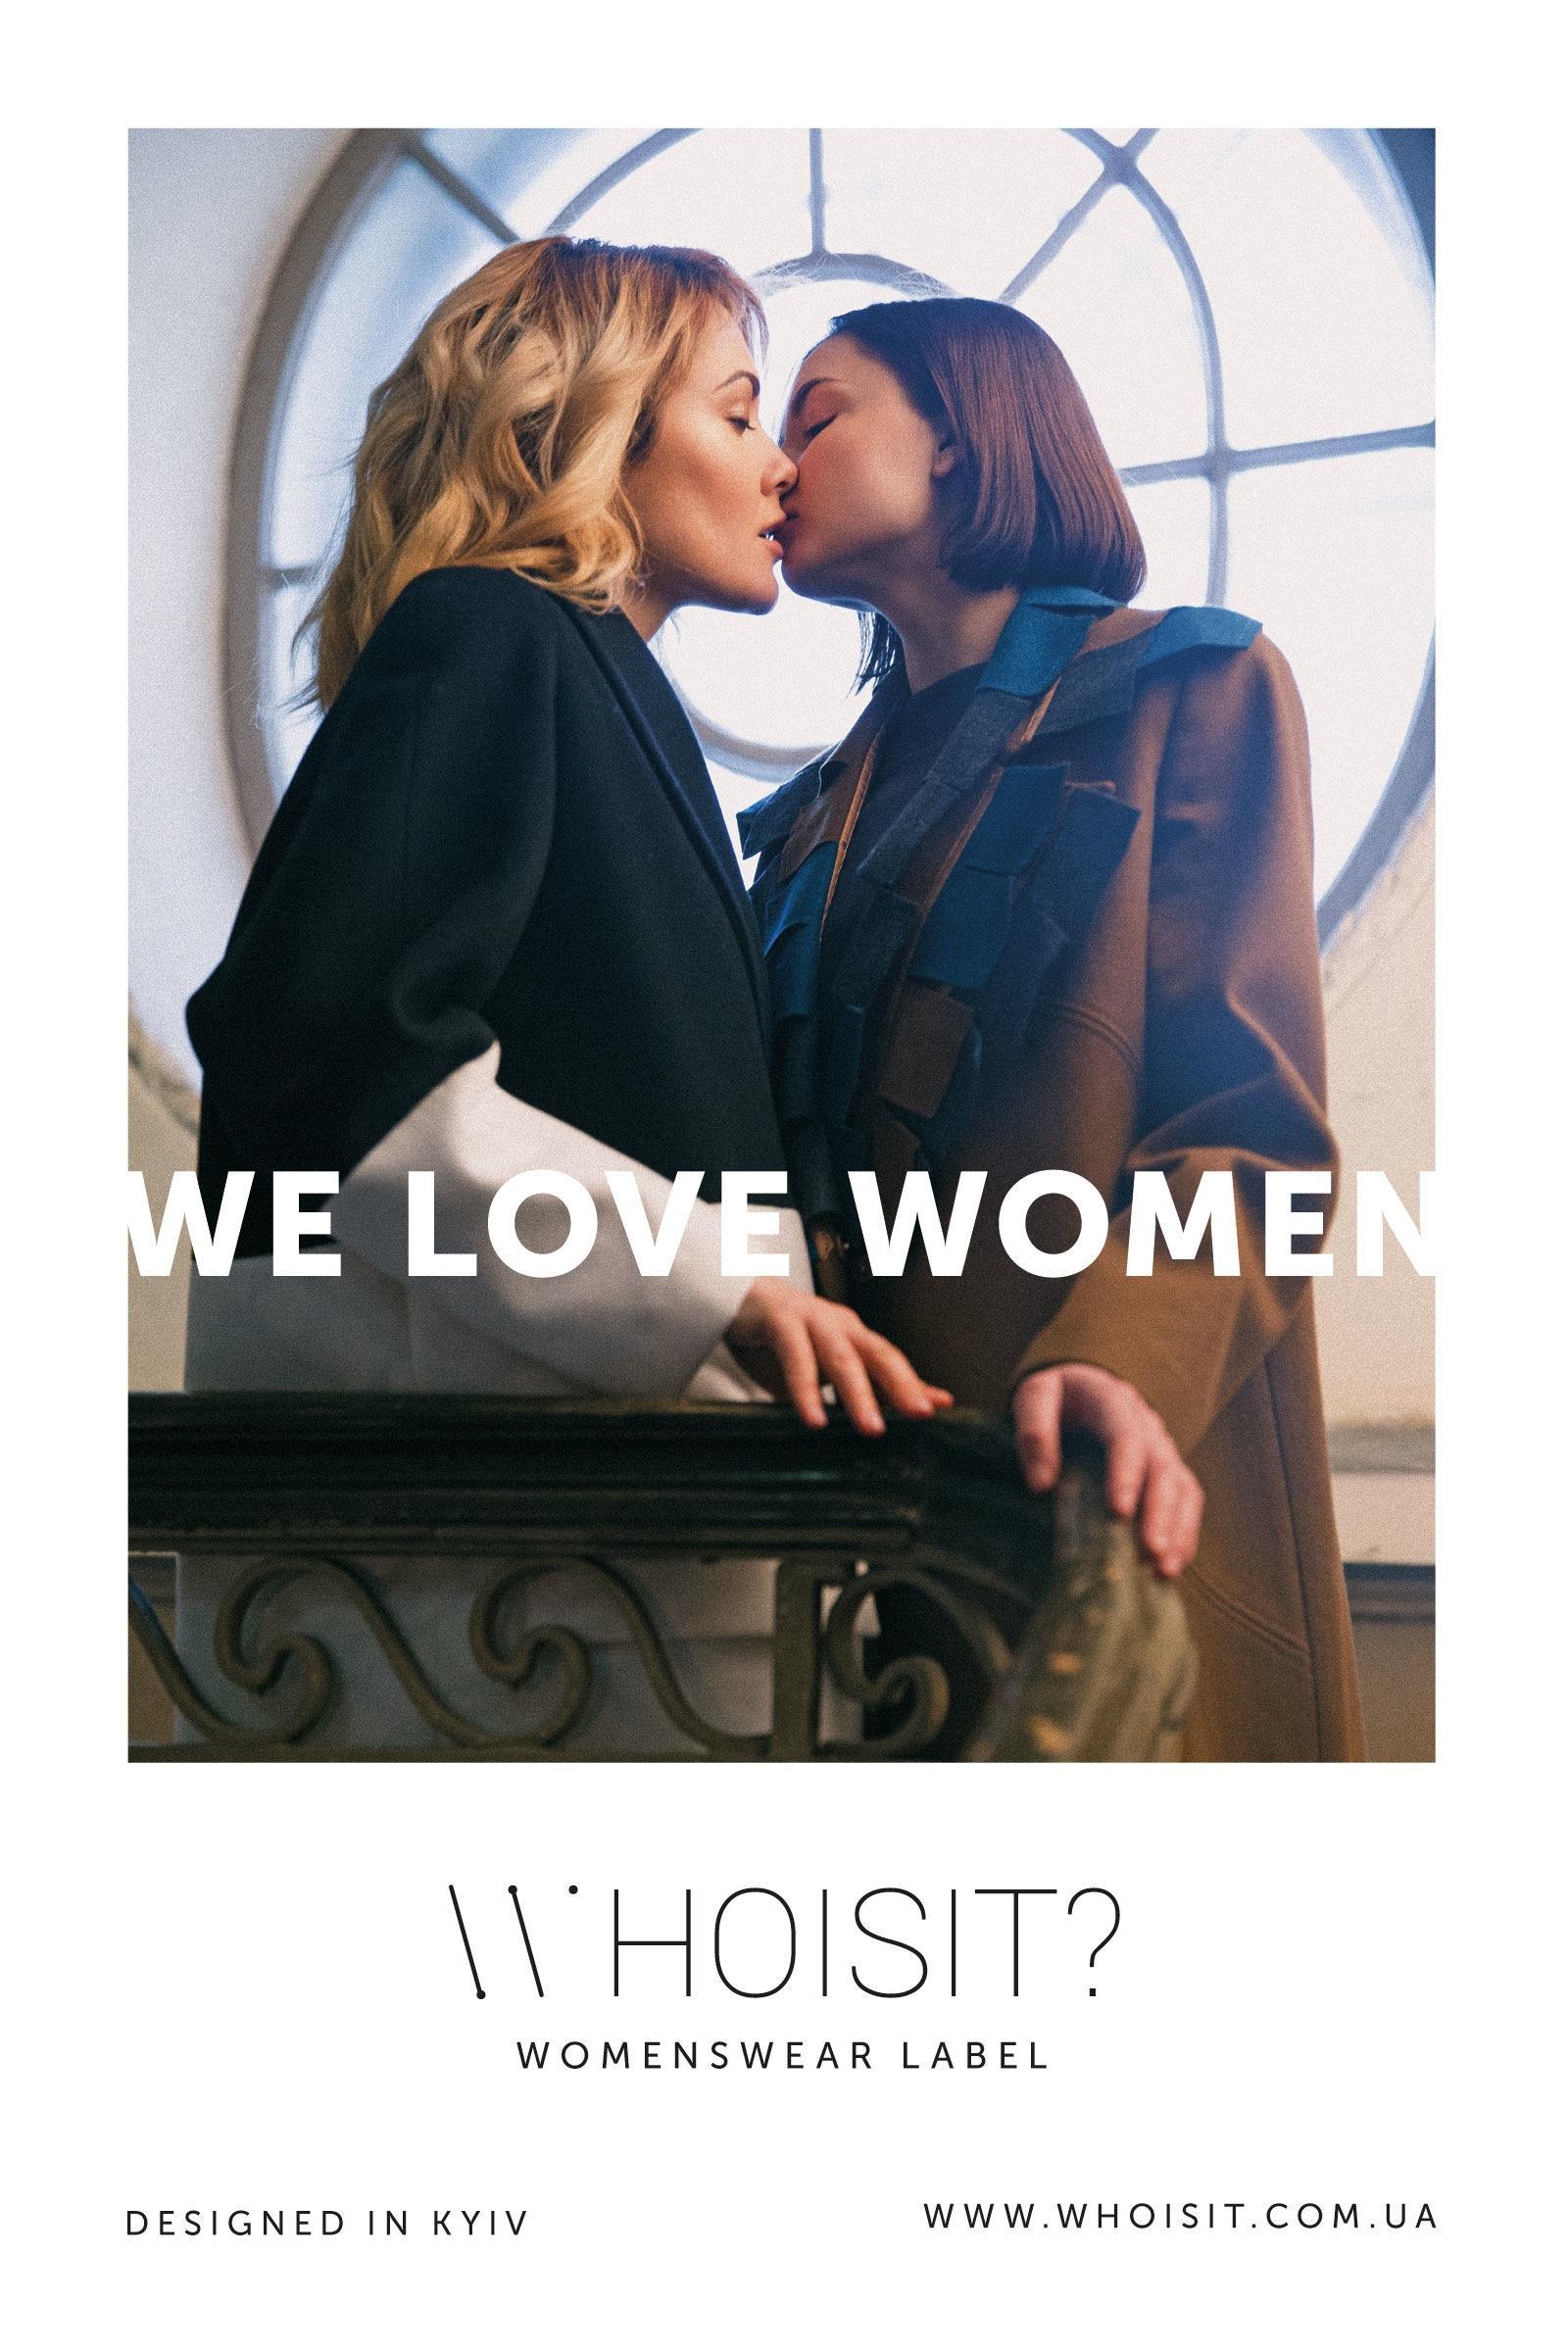 whoisit? Print Ad -  We love women, 4